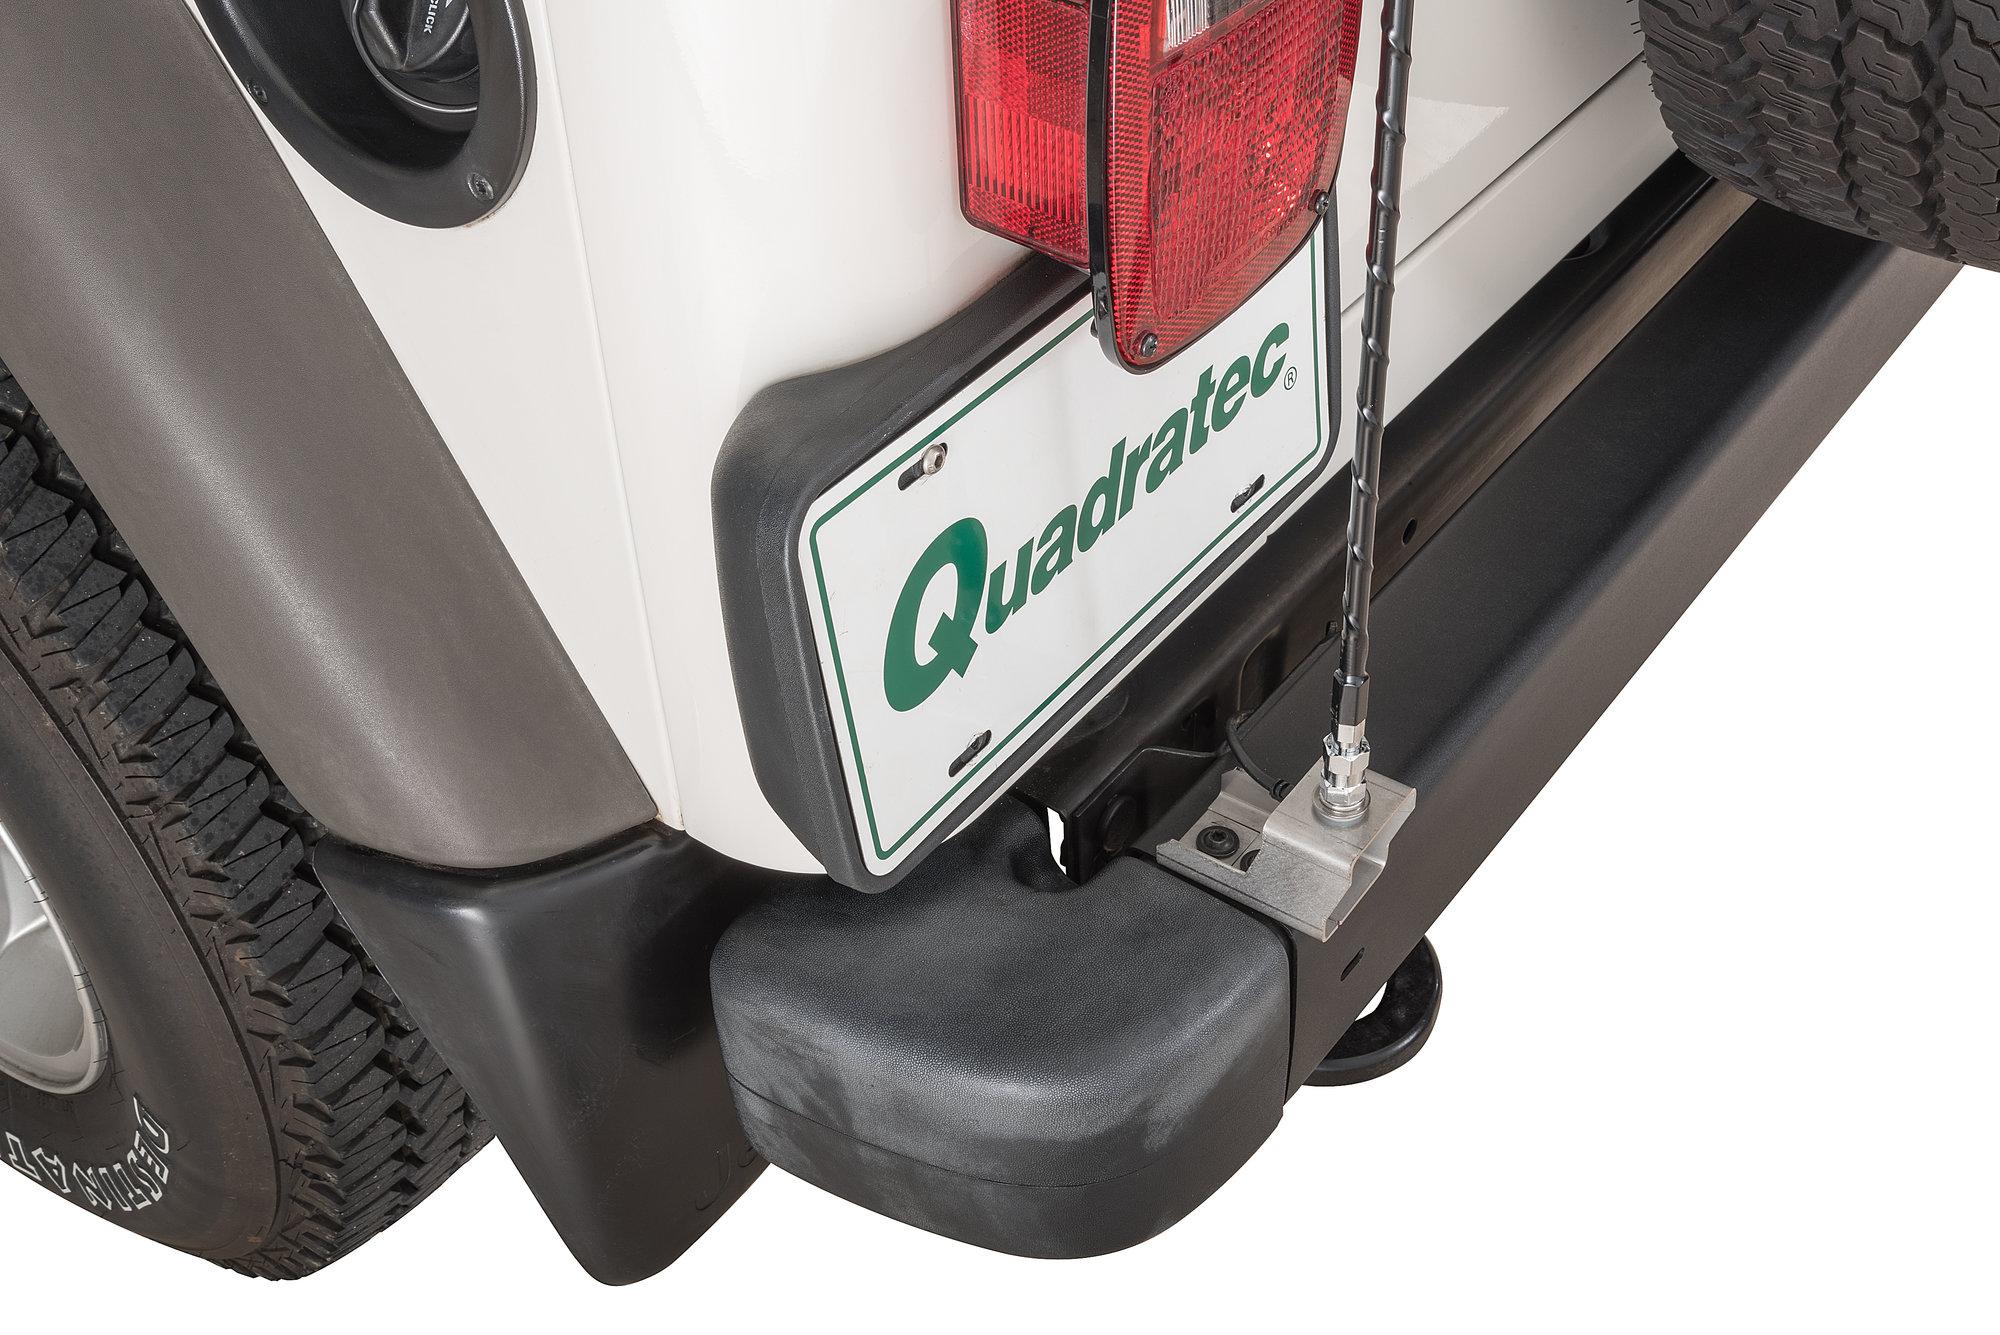 hight resolution of quadratec cb antenna mount kit for 97 06 jeep wrangler tj unlimited quadratec